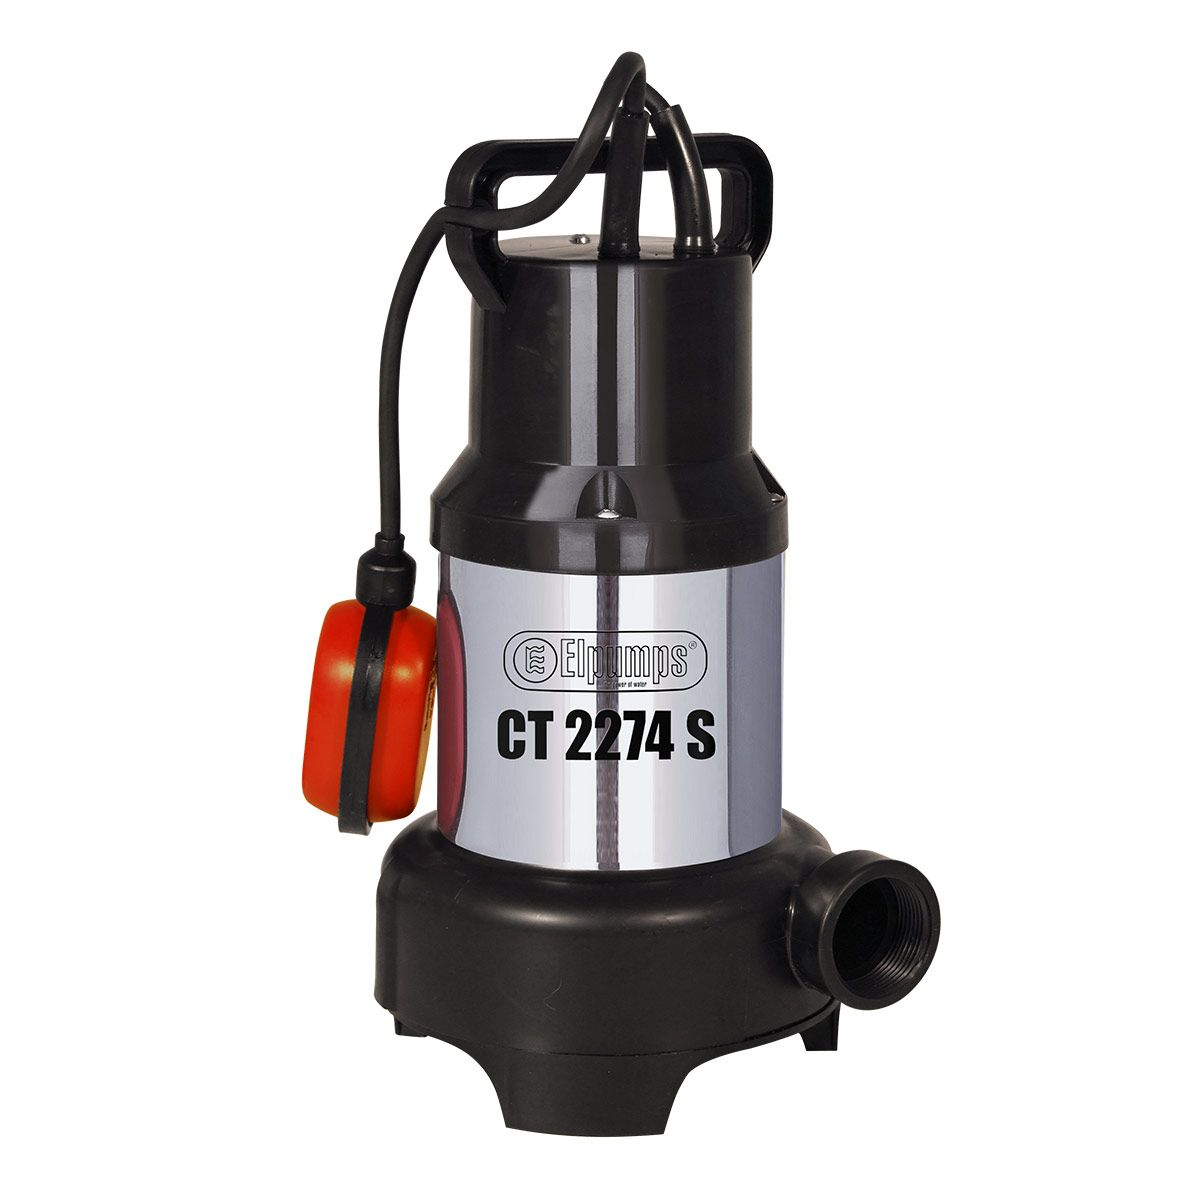 Abwasserpumpe CT 2274 S, H max 6.0 m, Q max 9000 l/h, 0.45 kW, 160 x 190 x 325 mm, 1 1/4' IG, 230 V